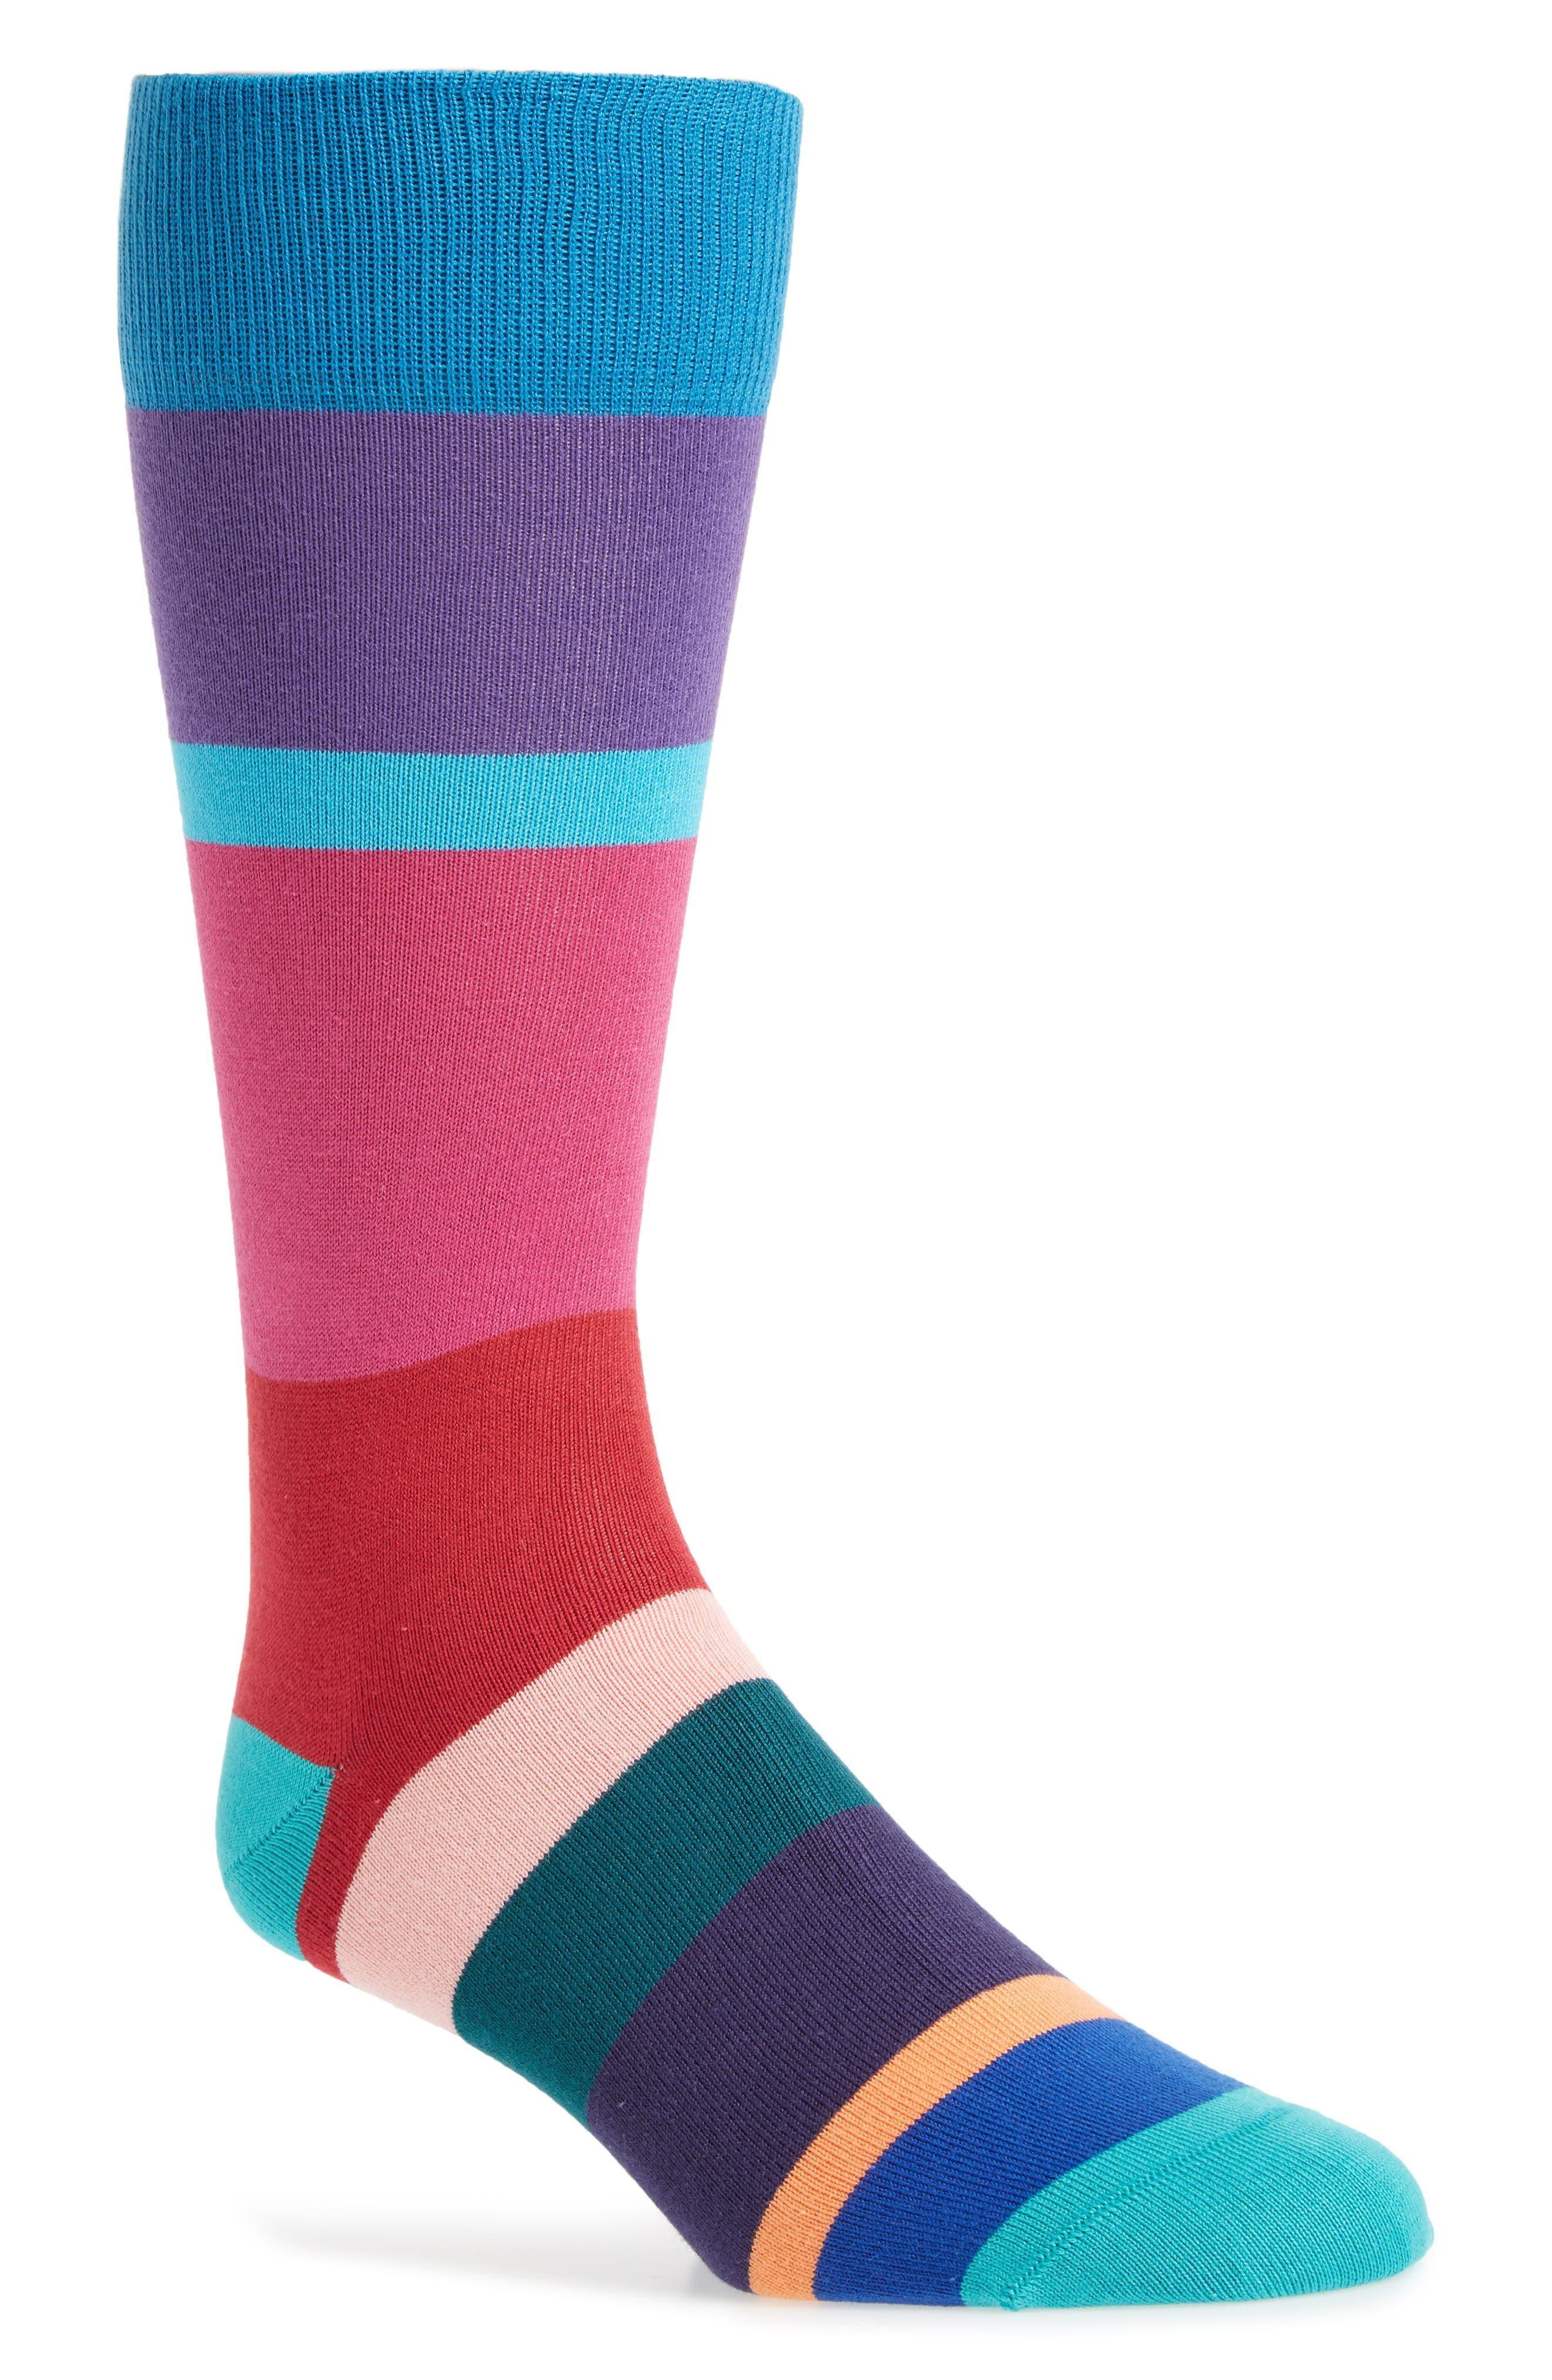 Jolly Colorblock Socks,                         Main,                         color, Green/ Blue Multi